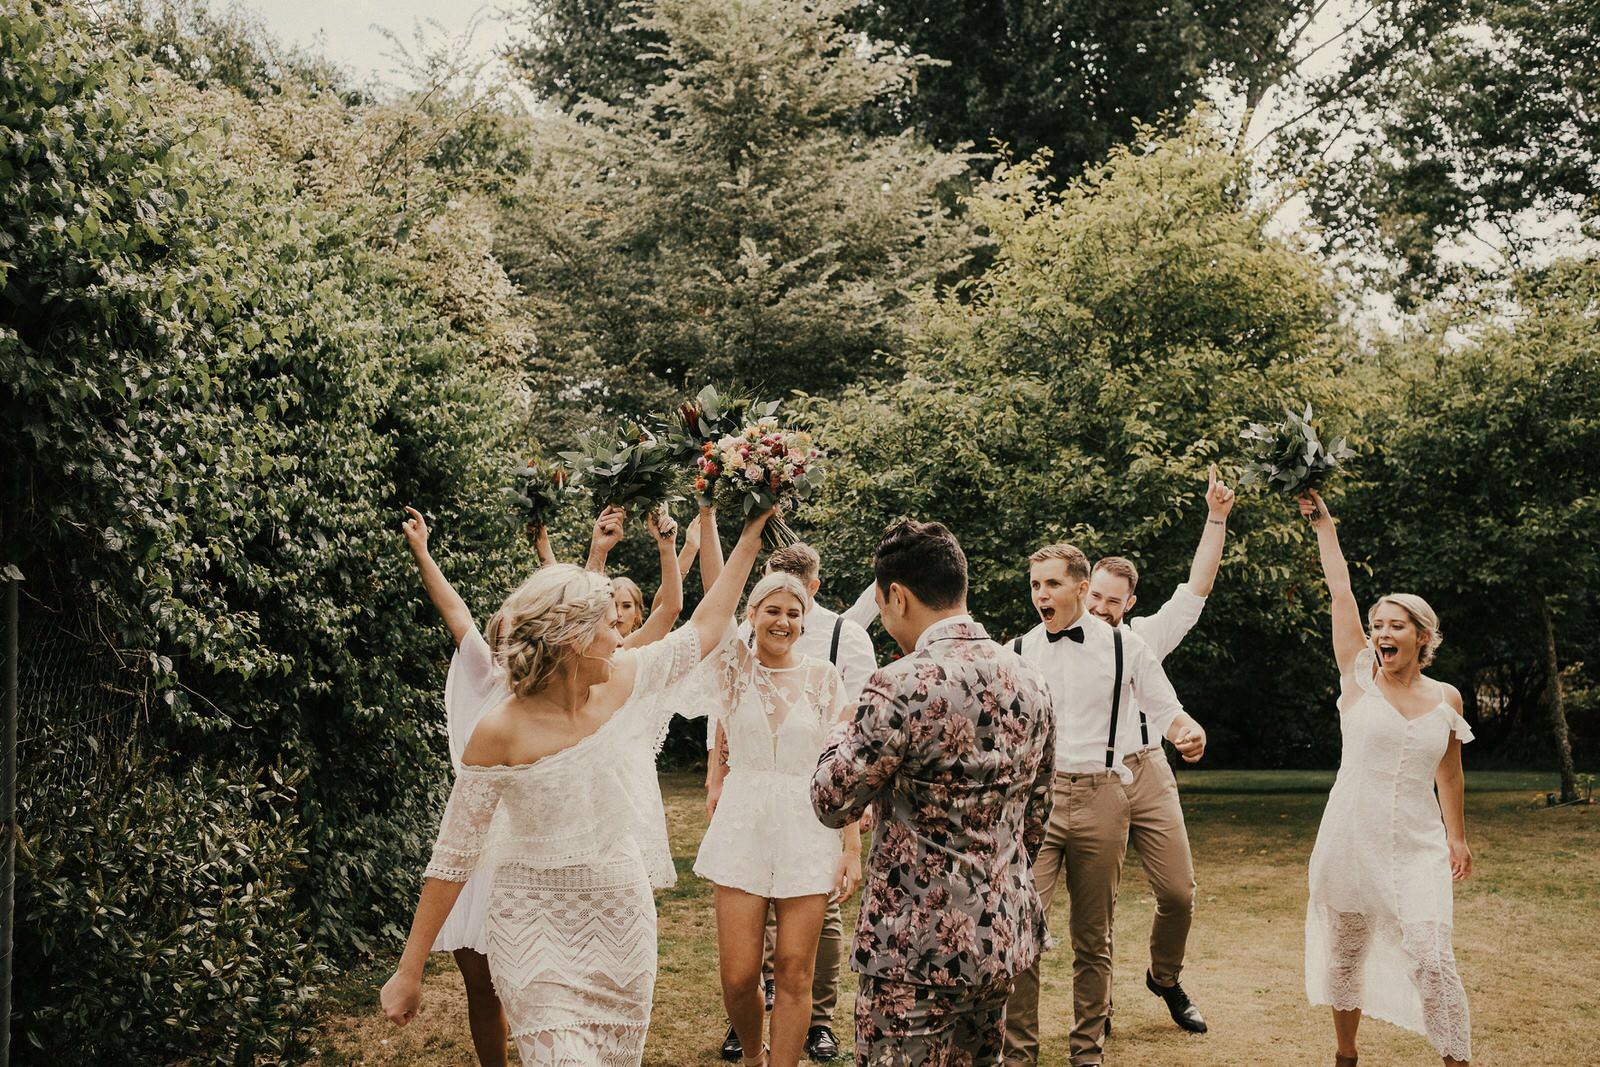 Wairarapa-Wedding_The-Landing_060.JPG